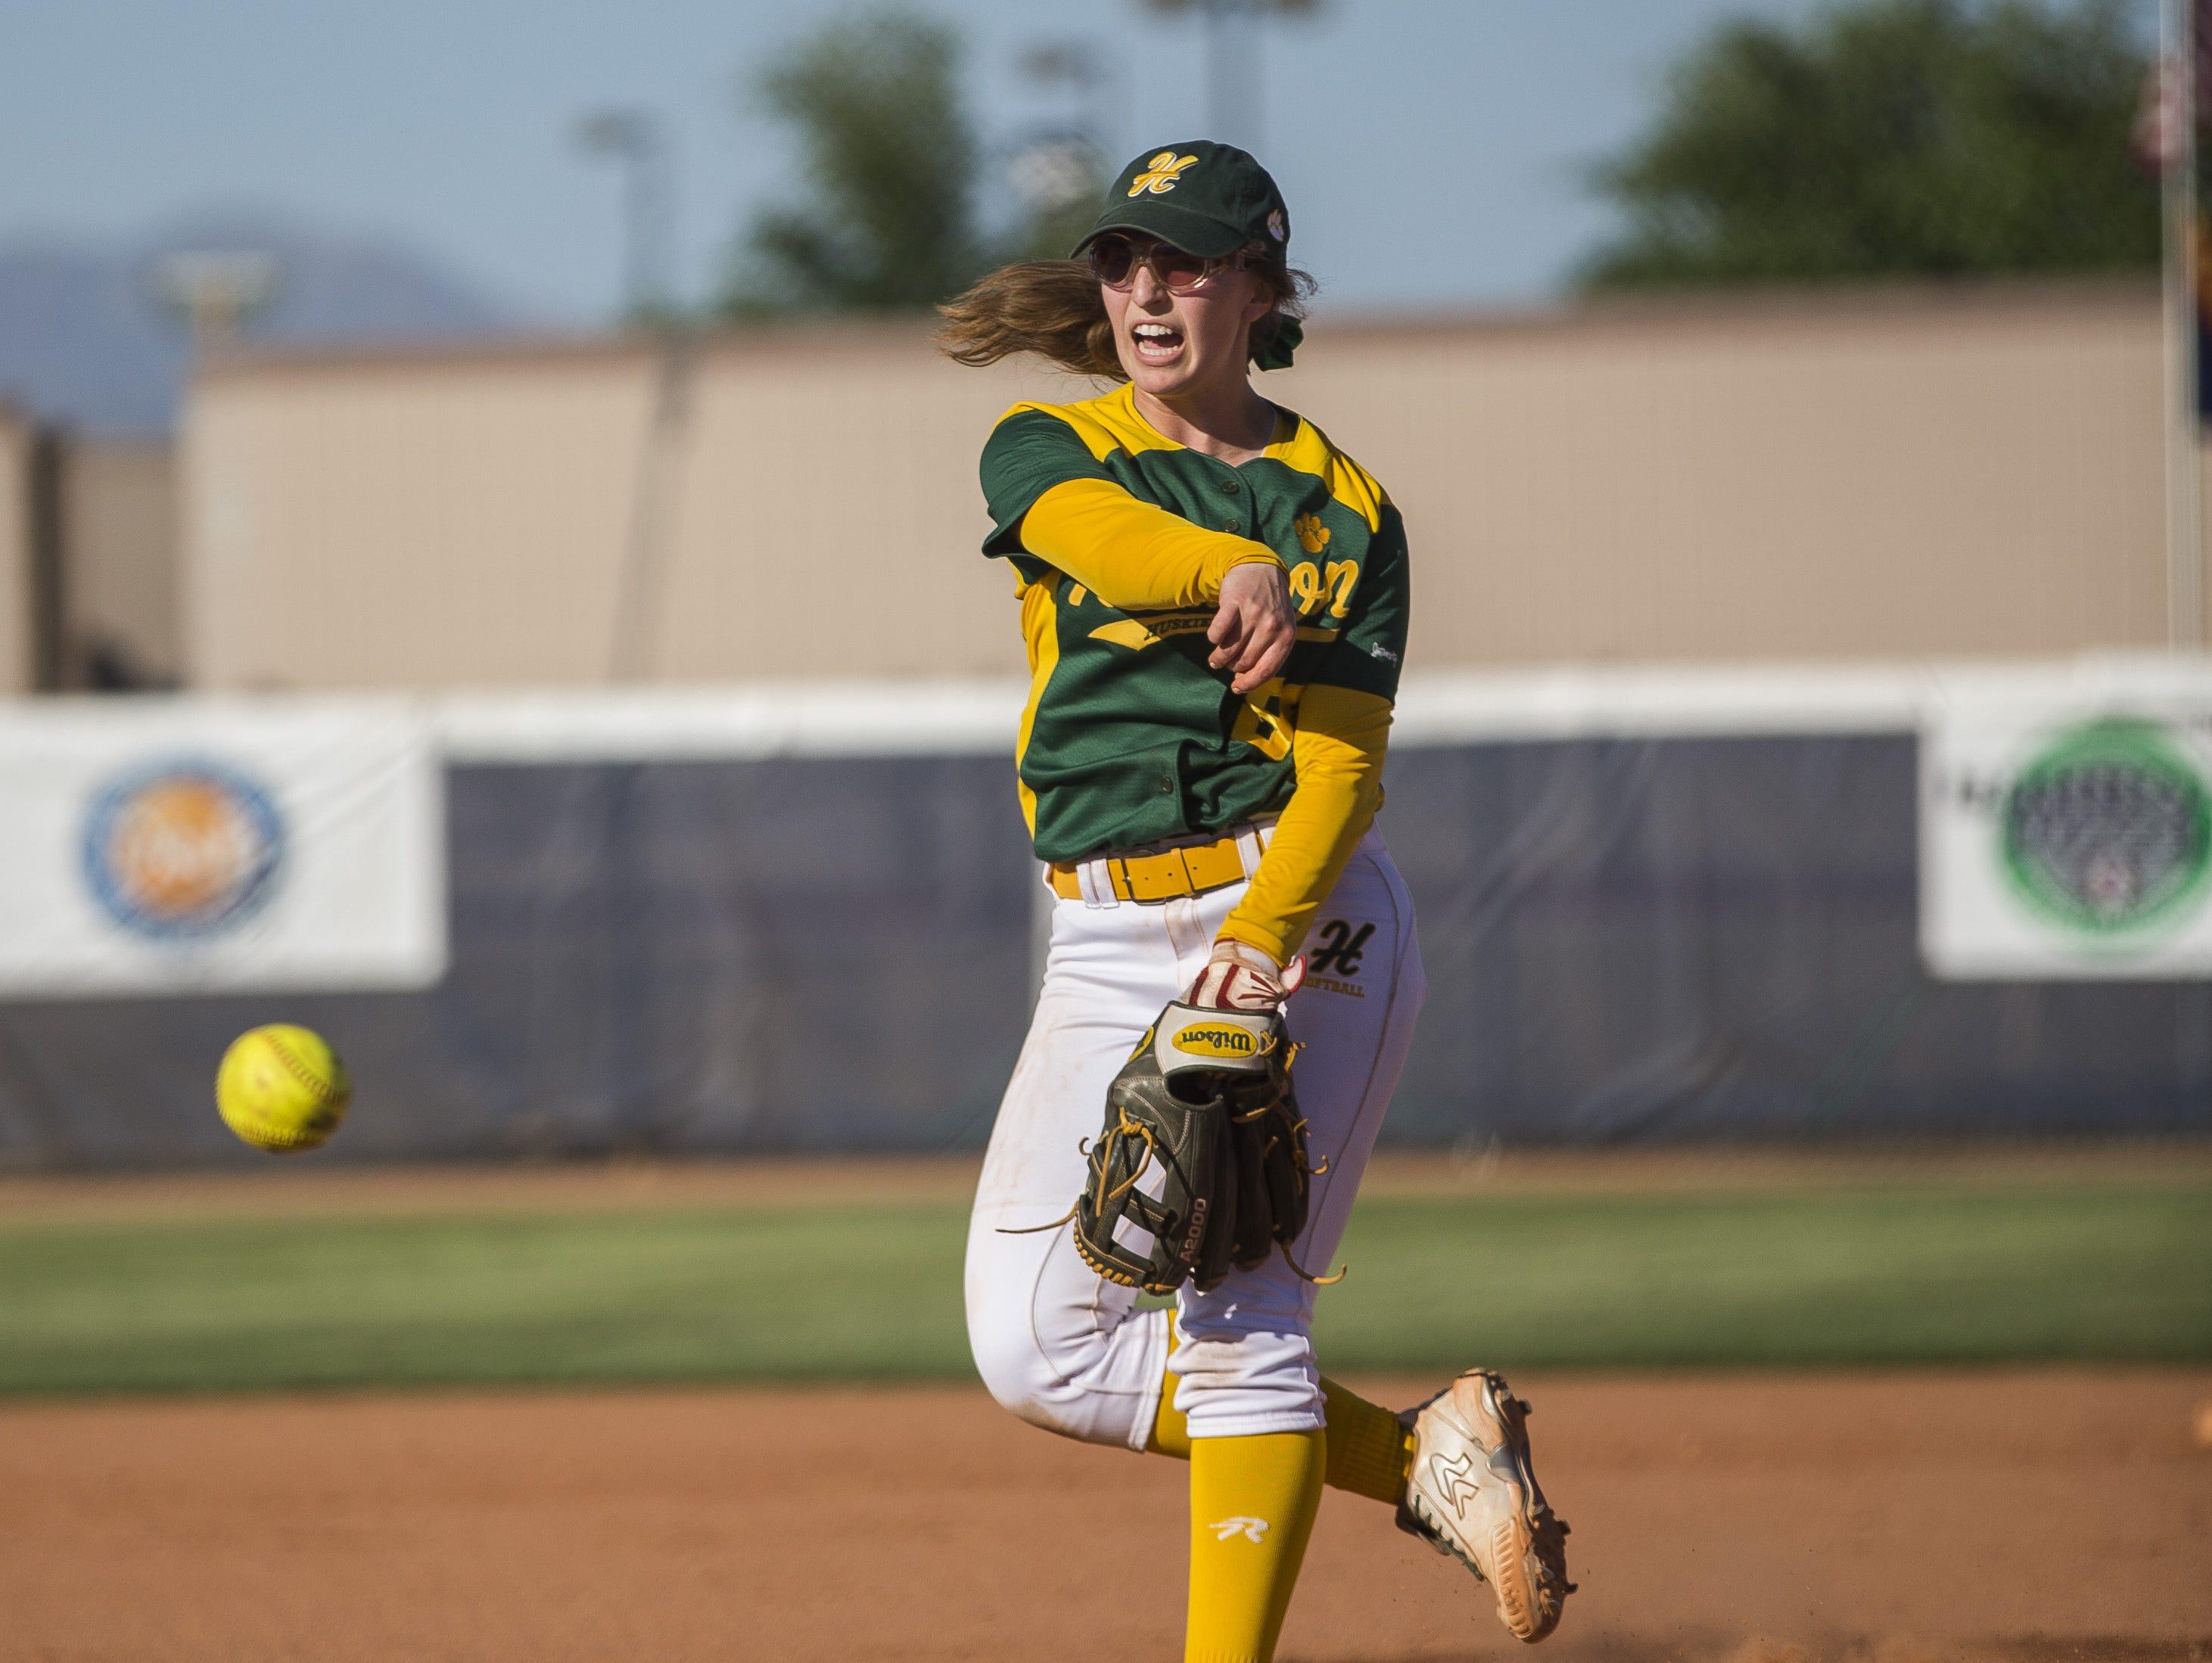 Horizon's Tamara Statman (88) against Pinnacle in the third inning at Pinnacle High School in Phoenix, AZ on March 30, 2015.